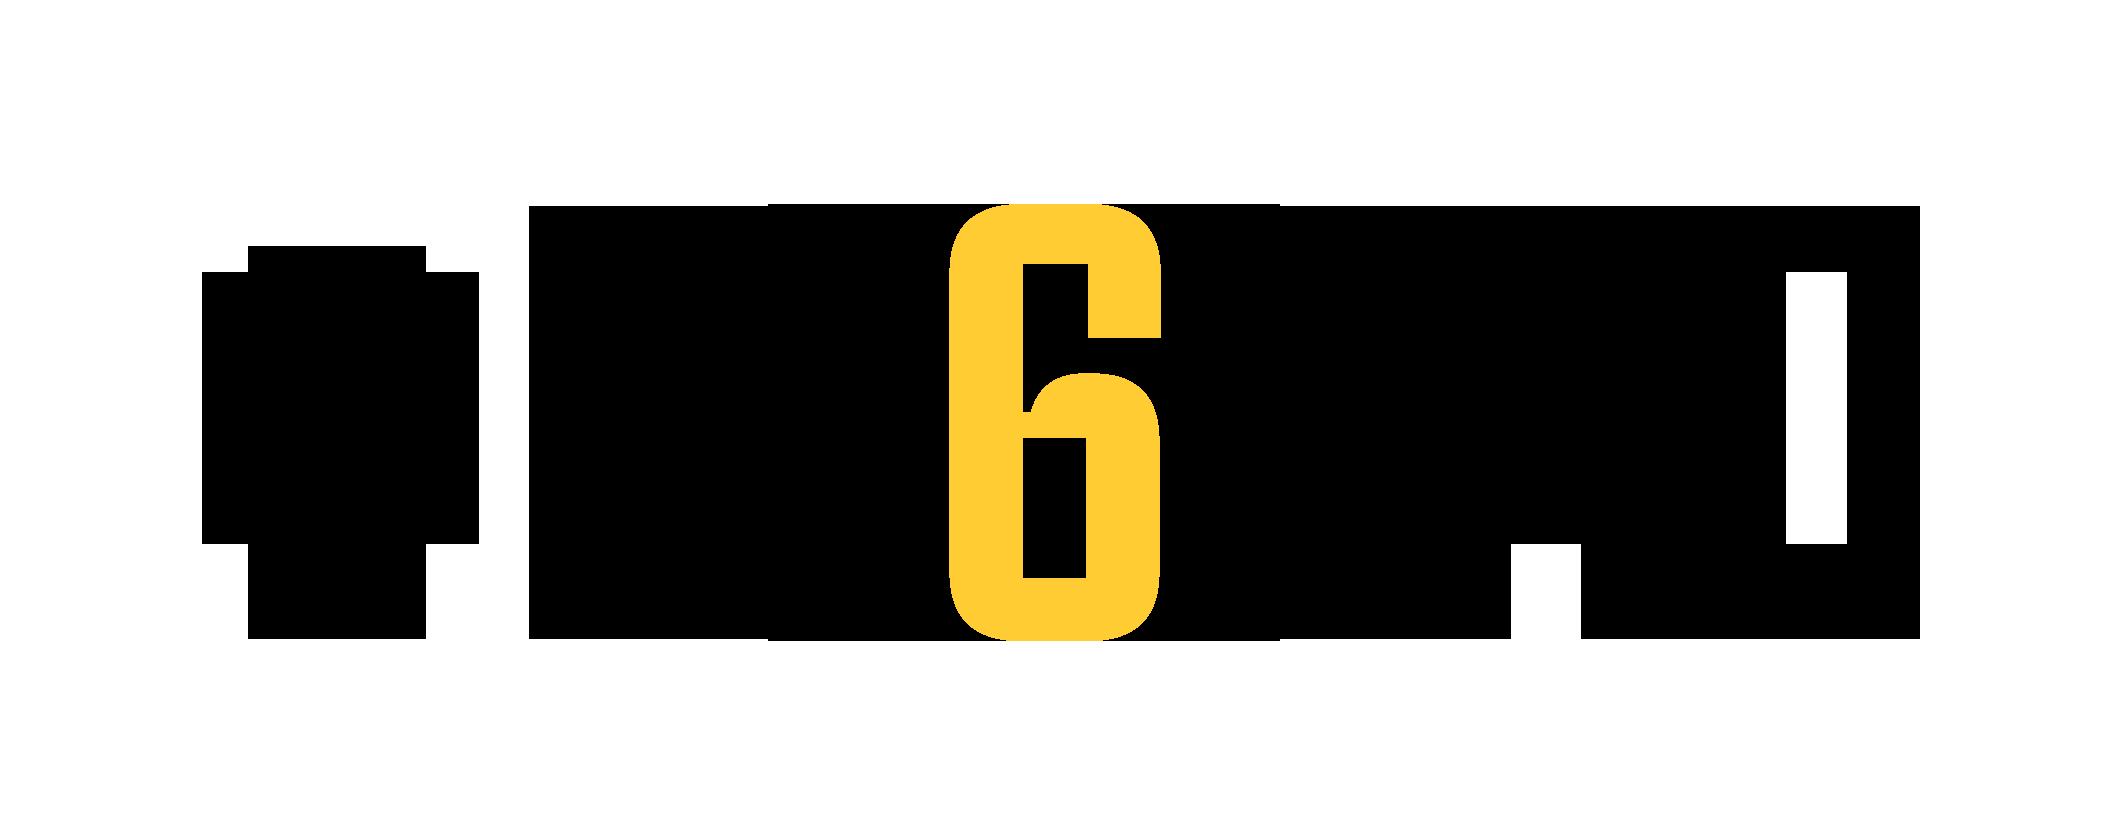 File 2016 17 Juventus Fc 6th Consecutive Scudetto S Celebrative Hashtag Png Wikimedia Commons